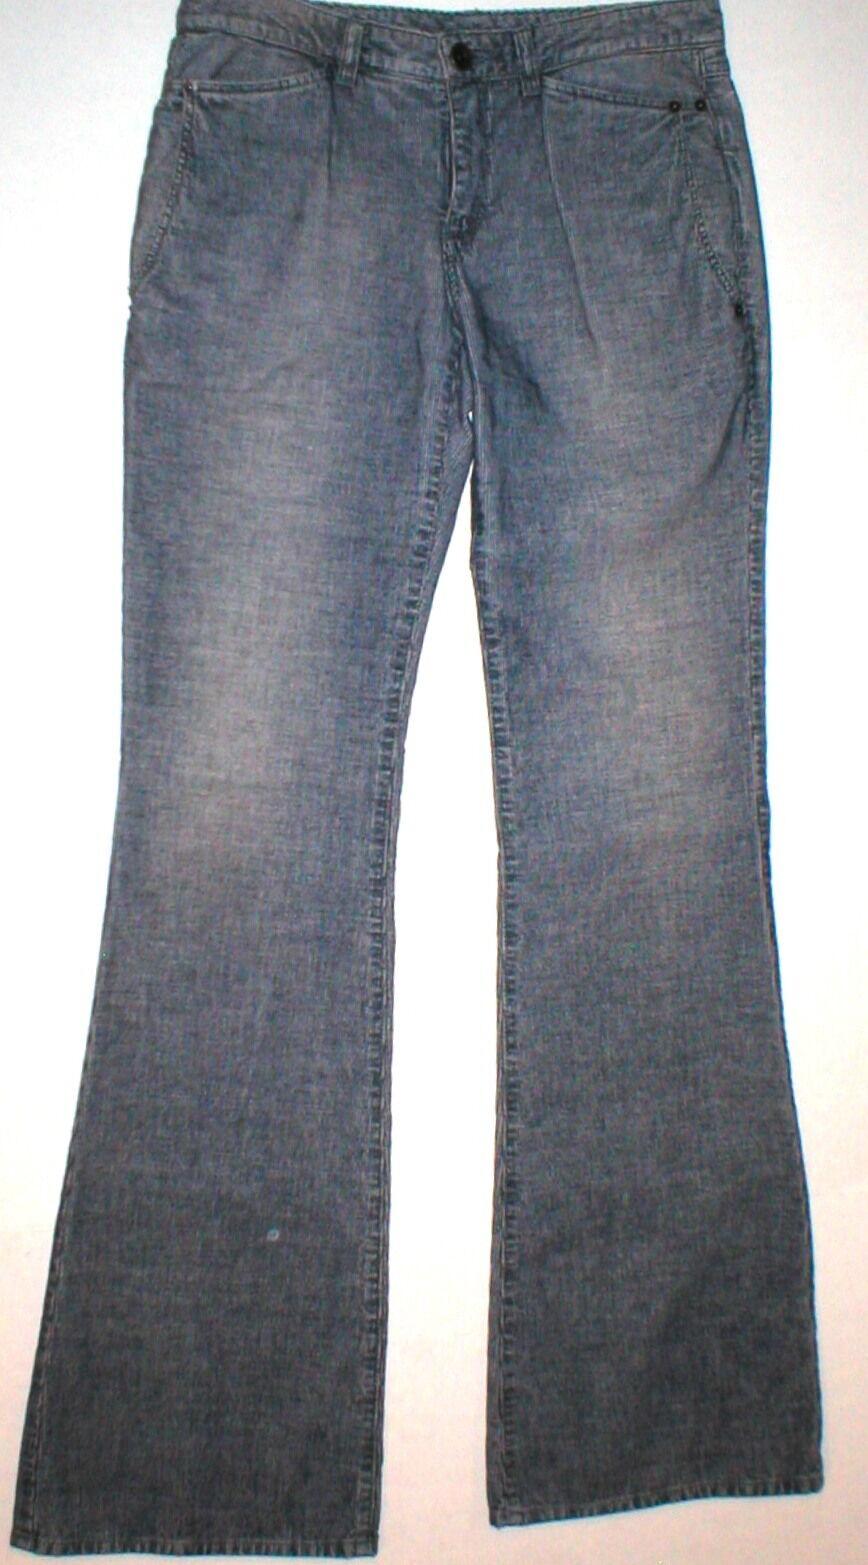 Nouve295 Theyskens& 039;s Theory Velours Côtelé Pantalon Jeans Femme 25 flare Blau indigo Cordon